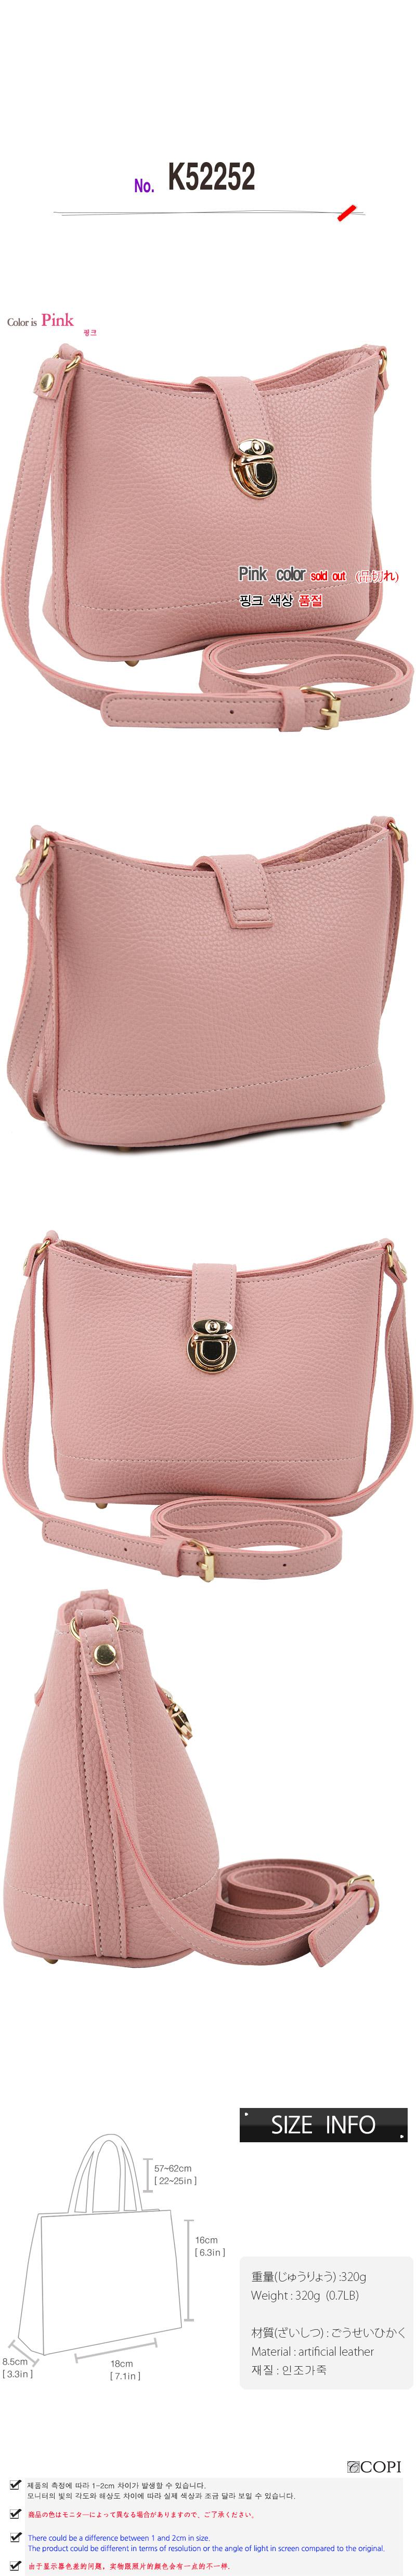 minibag no.K52252view